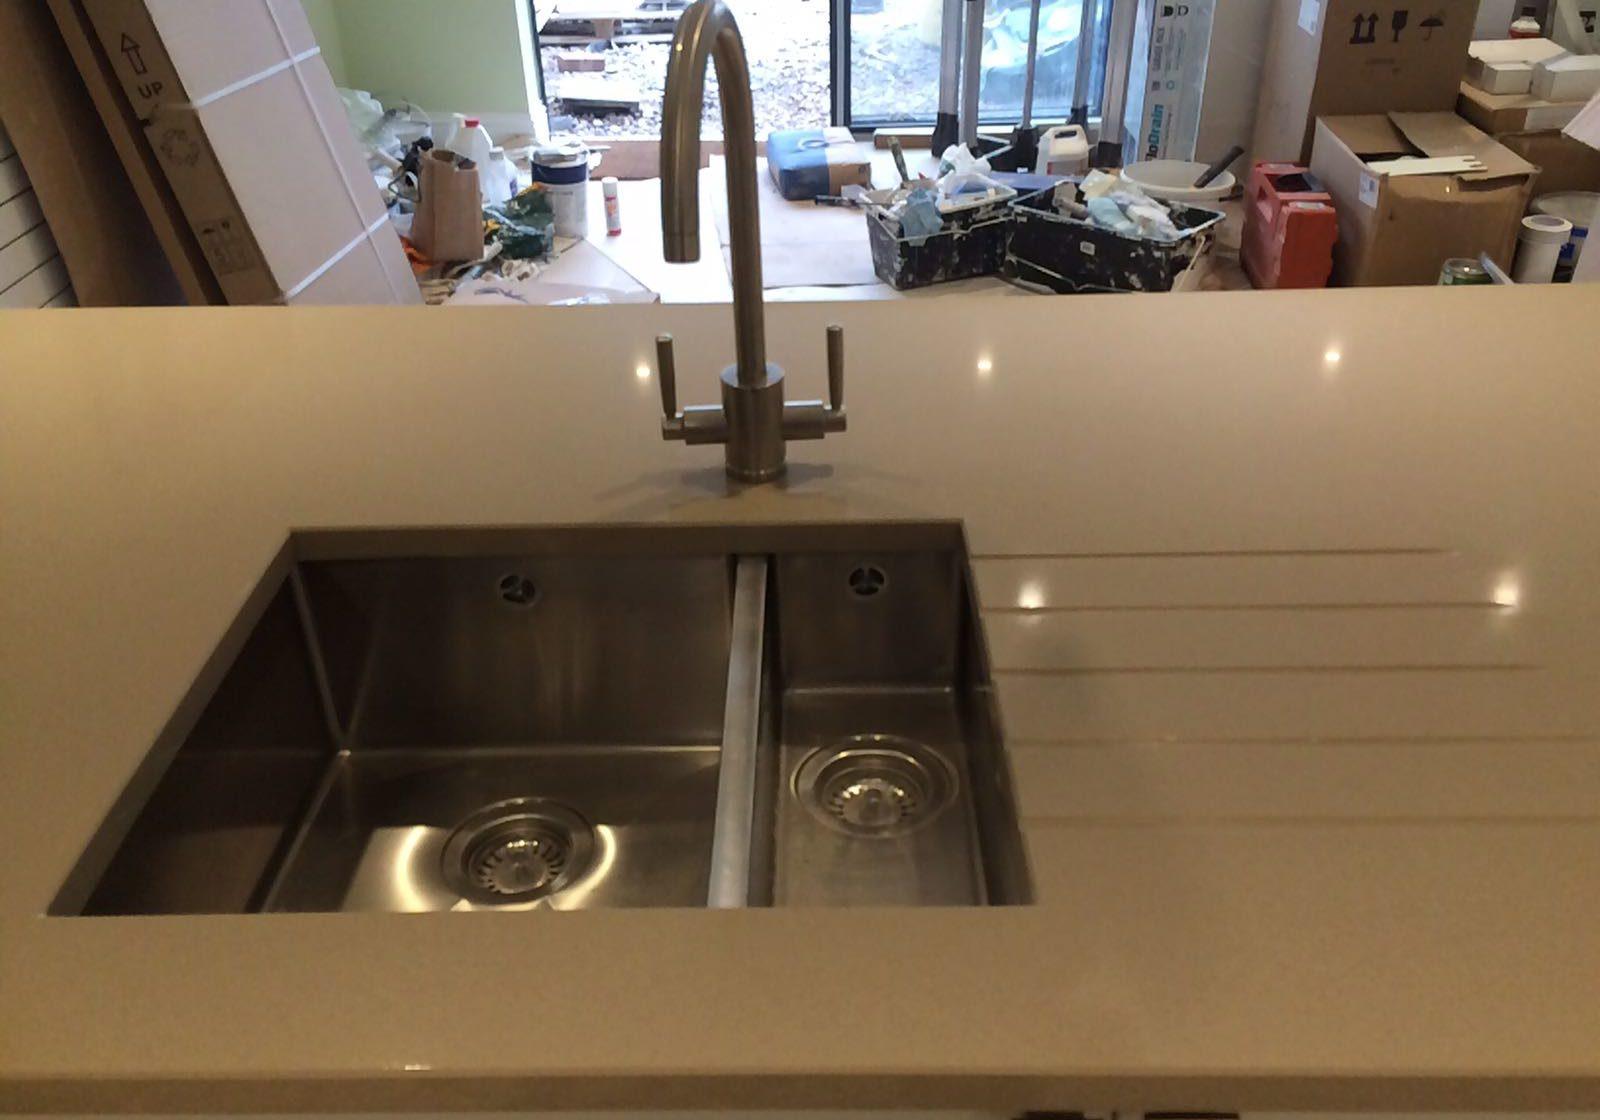 Bristol Beige Sink with Drainer Grooves